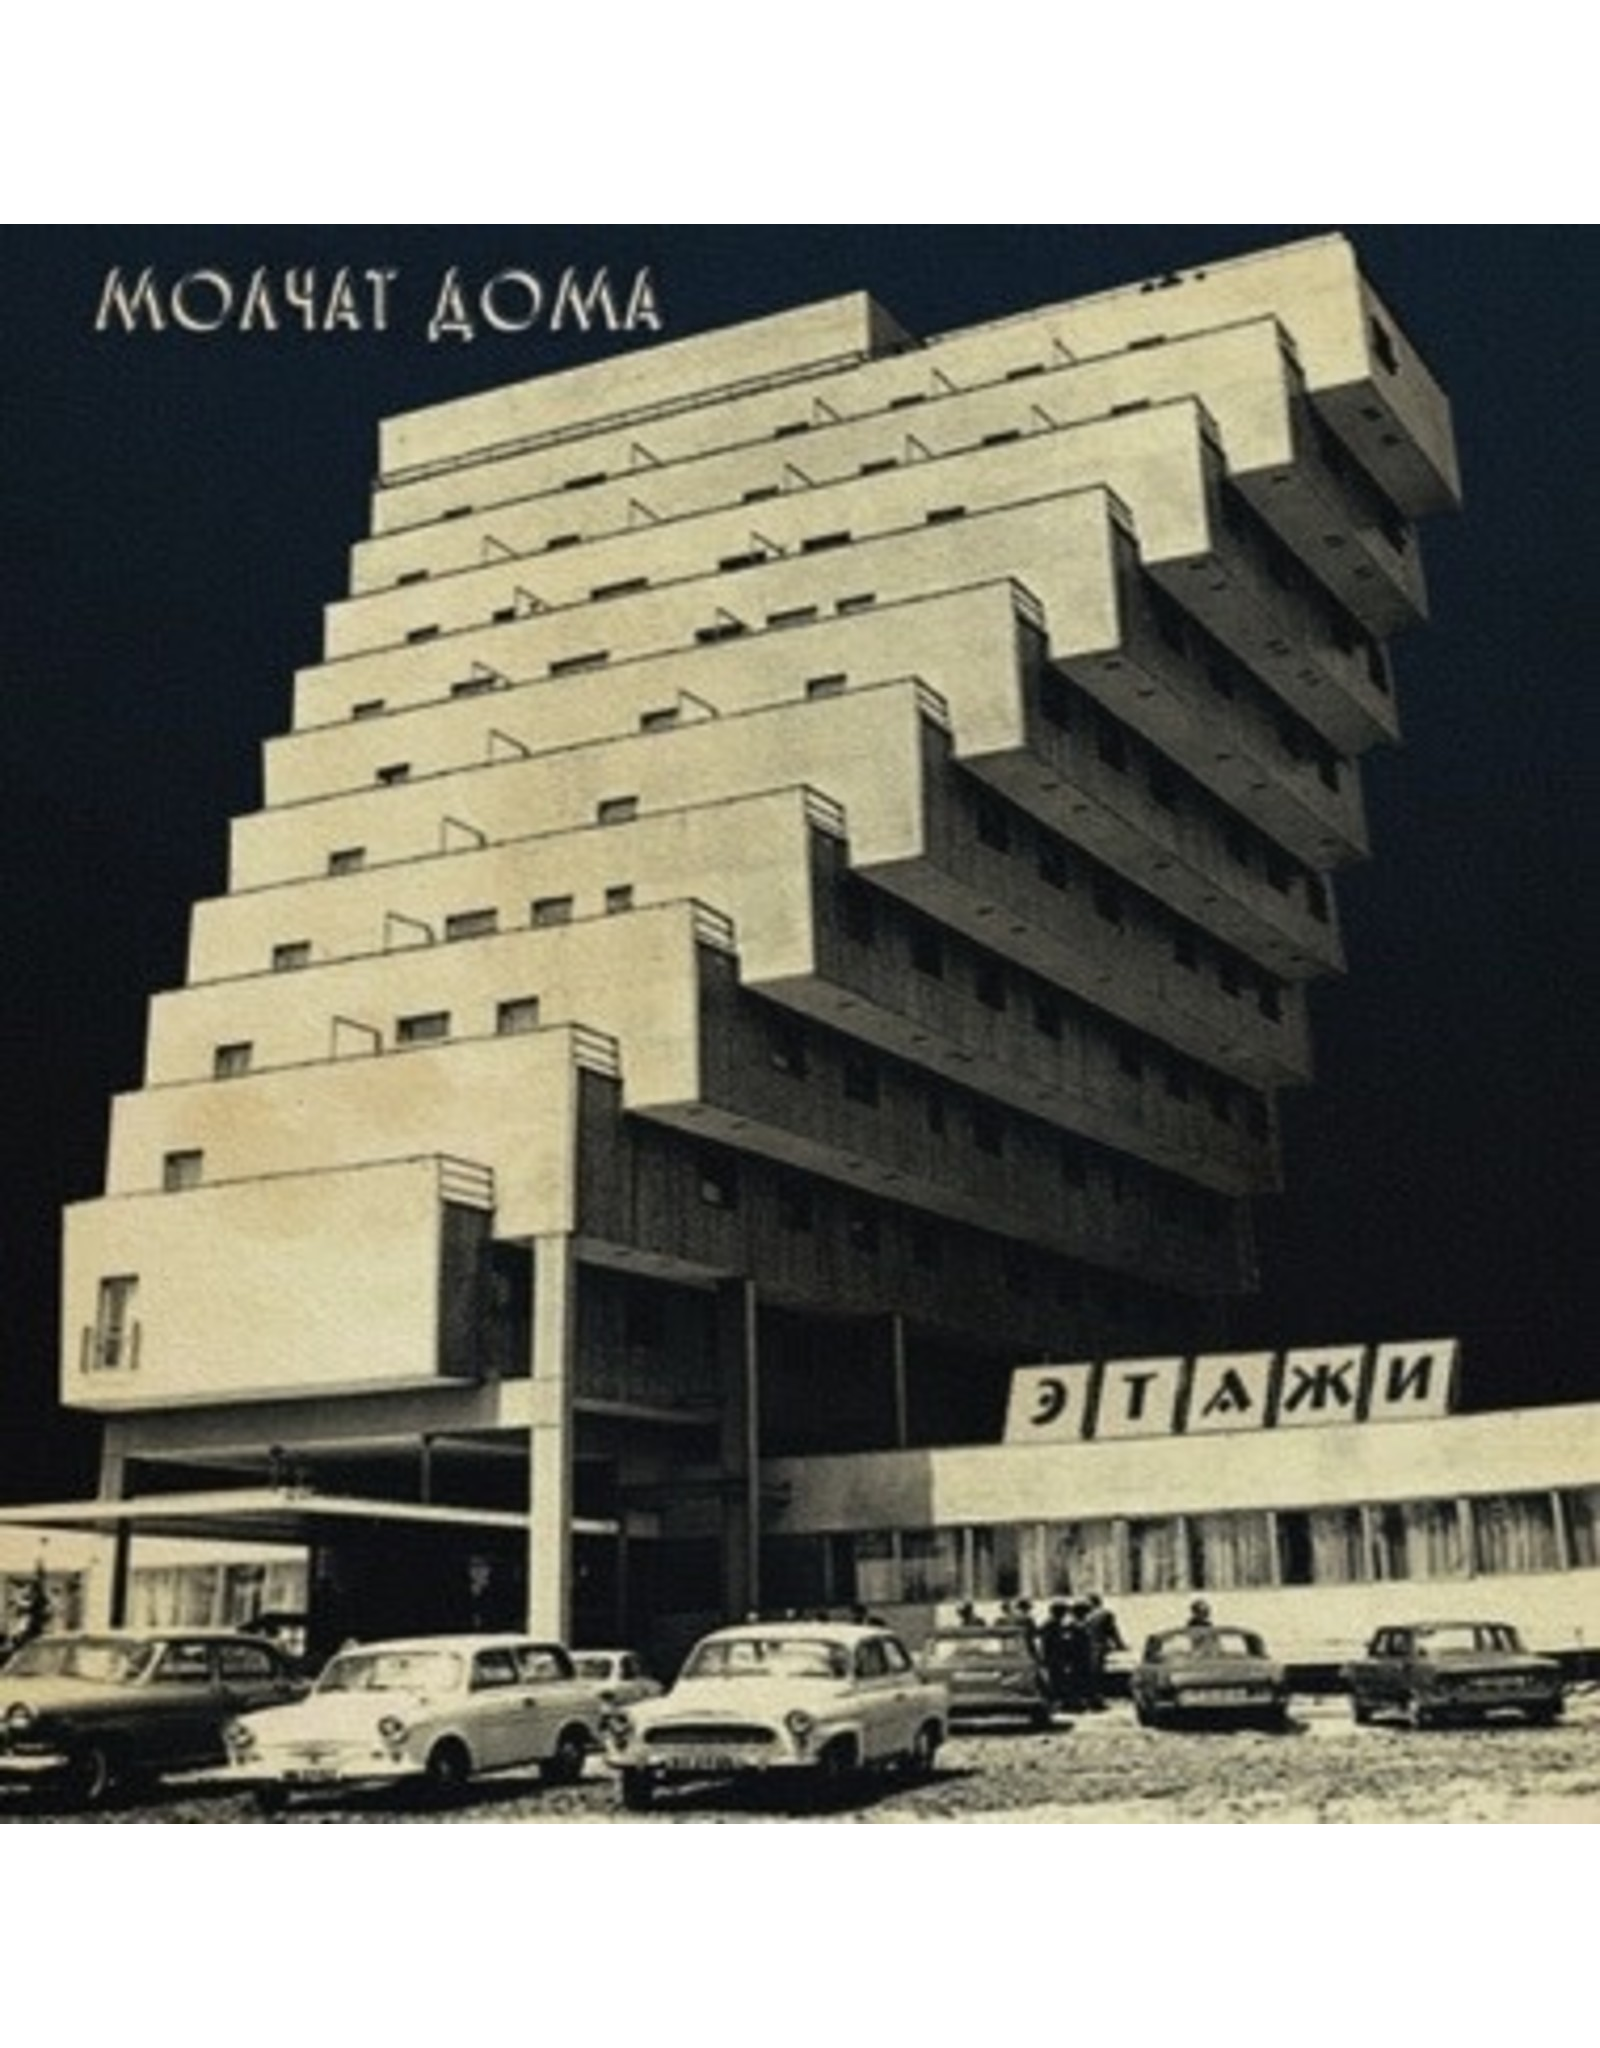 New Vinyl Molchat Doma - Этажив (Coke Bottle Clear) LP